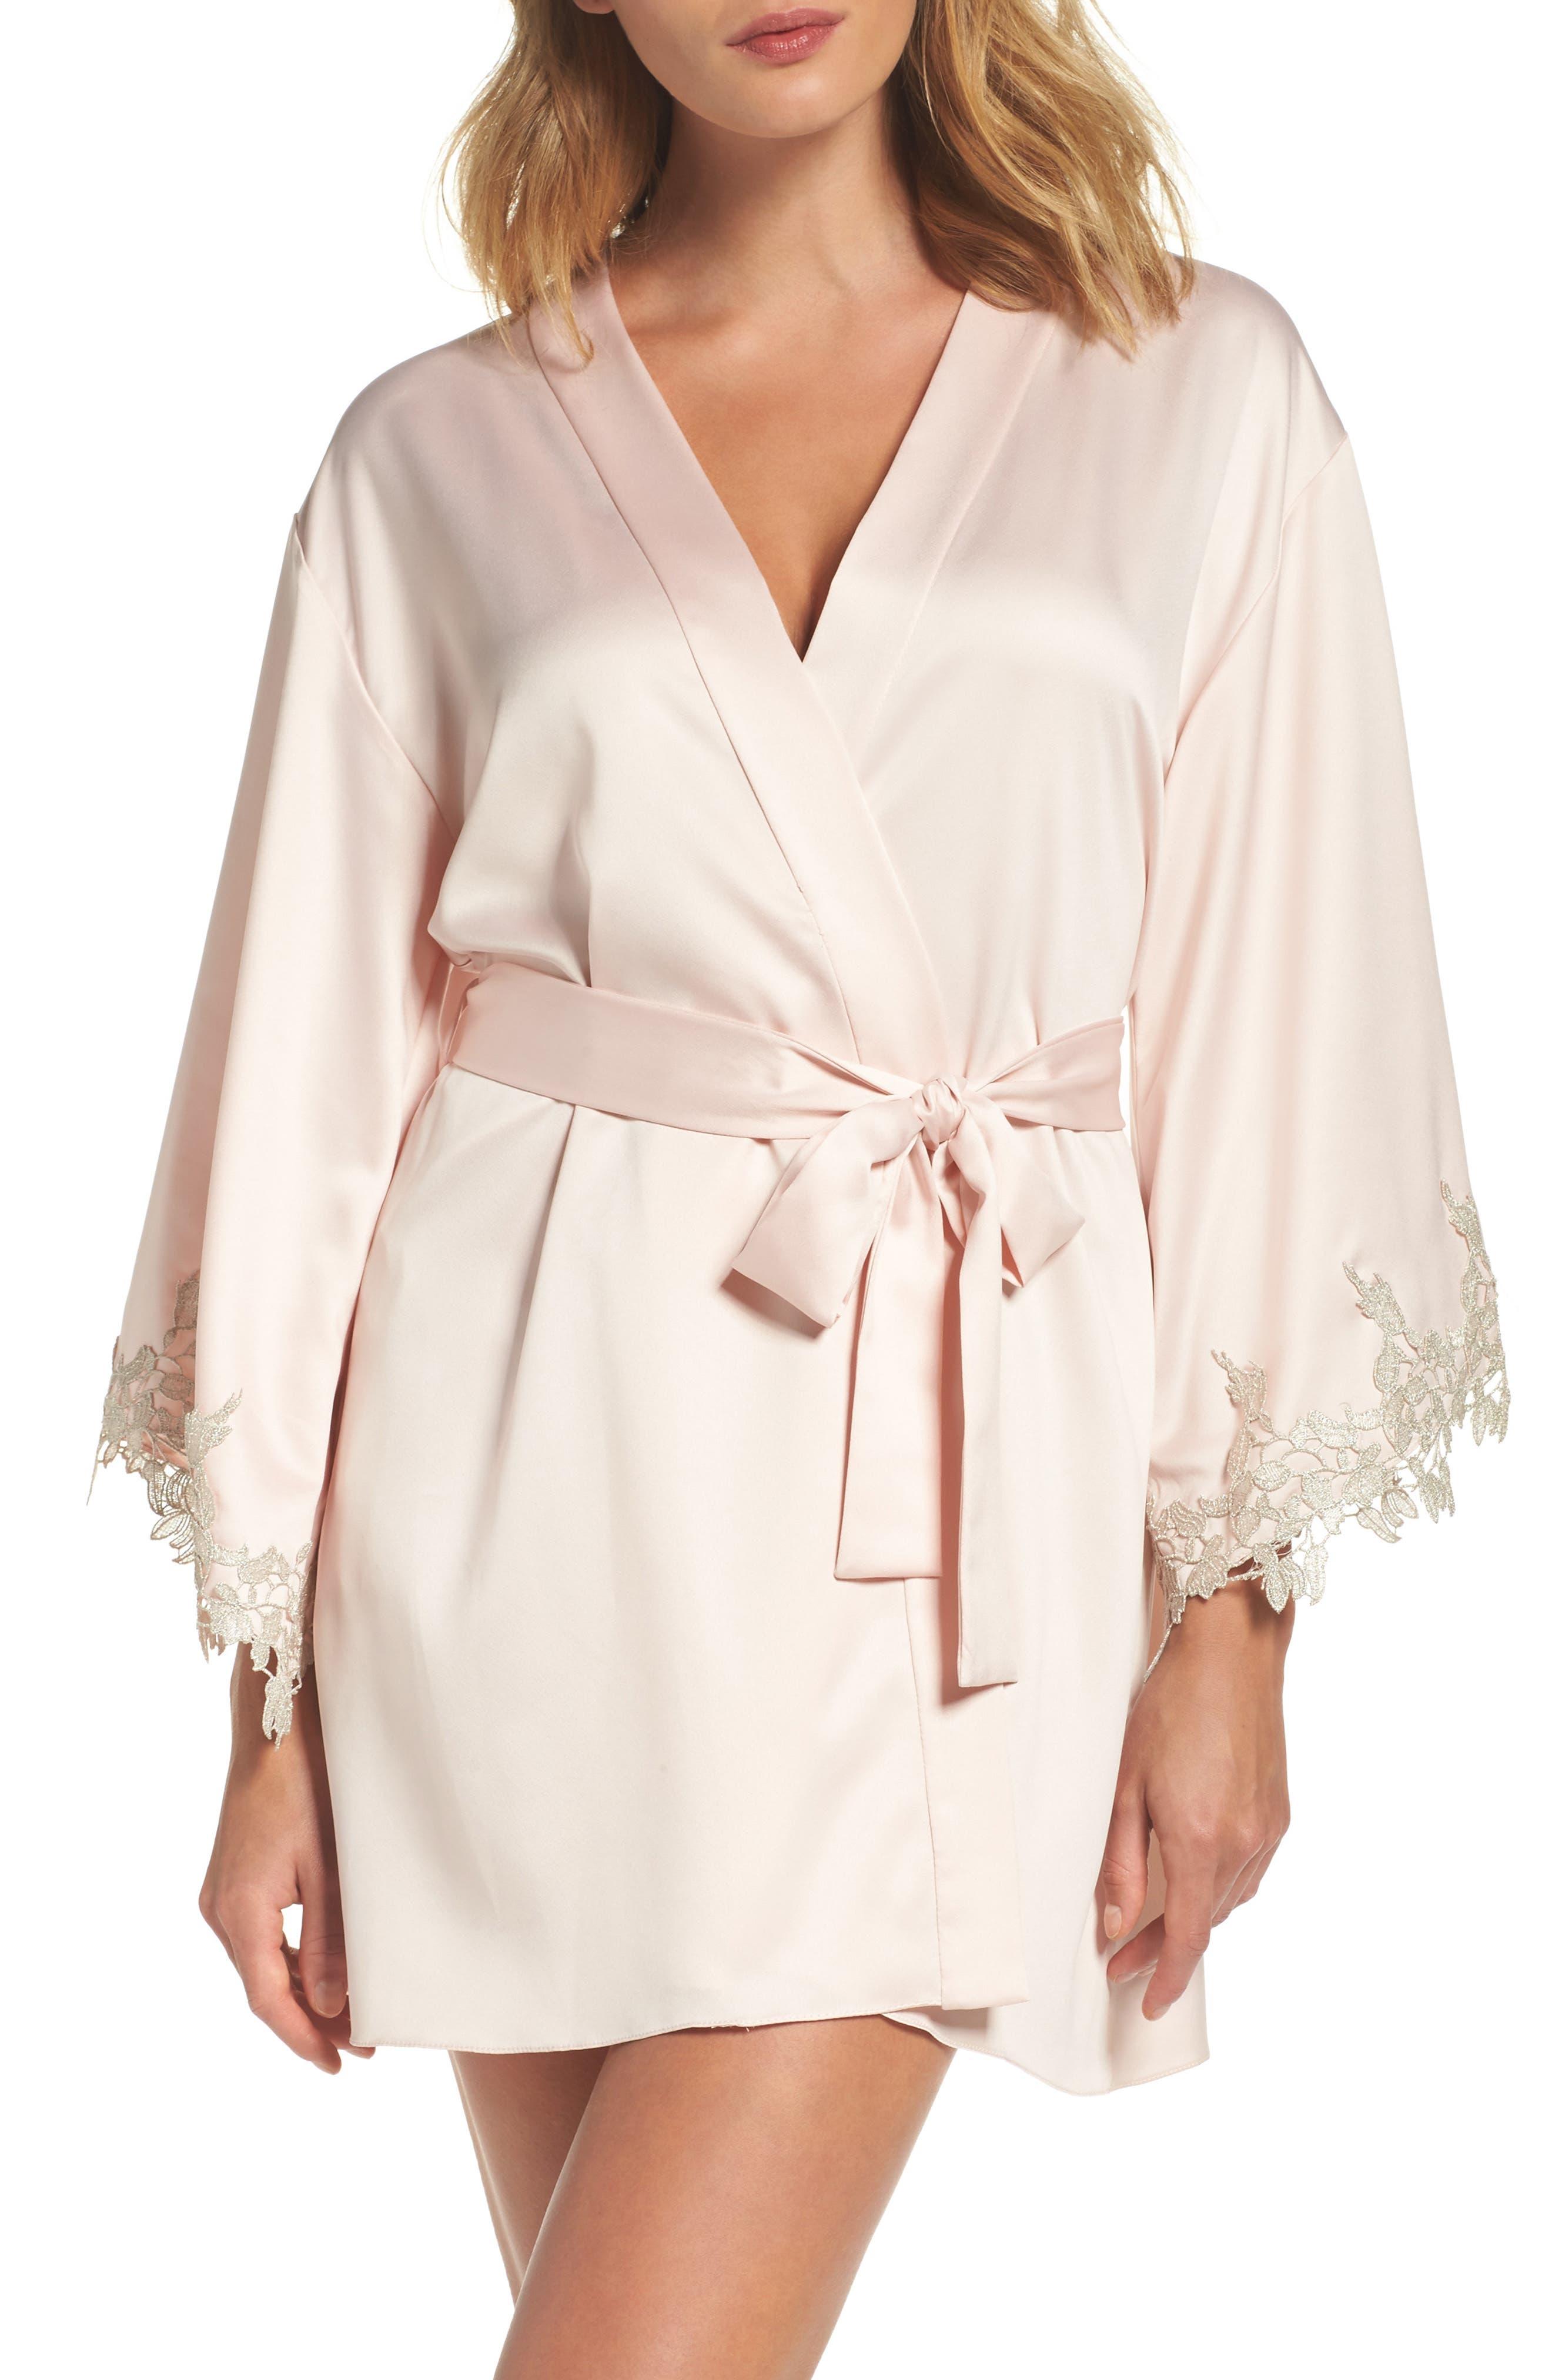 Alessia Charm Satin Robe,                         Main,                         color, 950